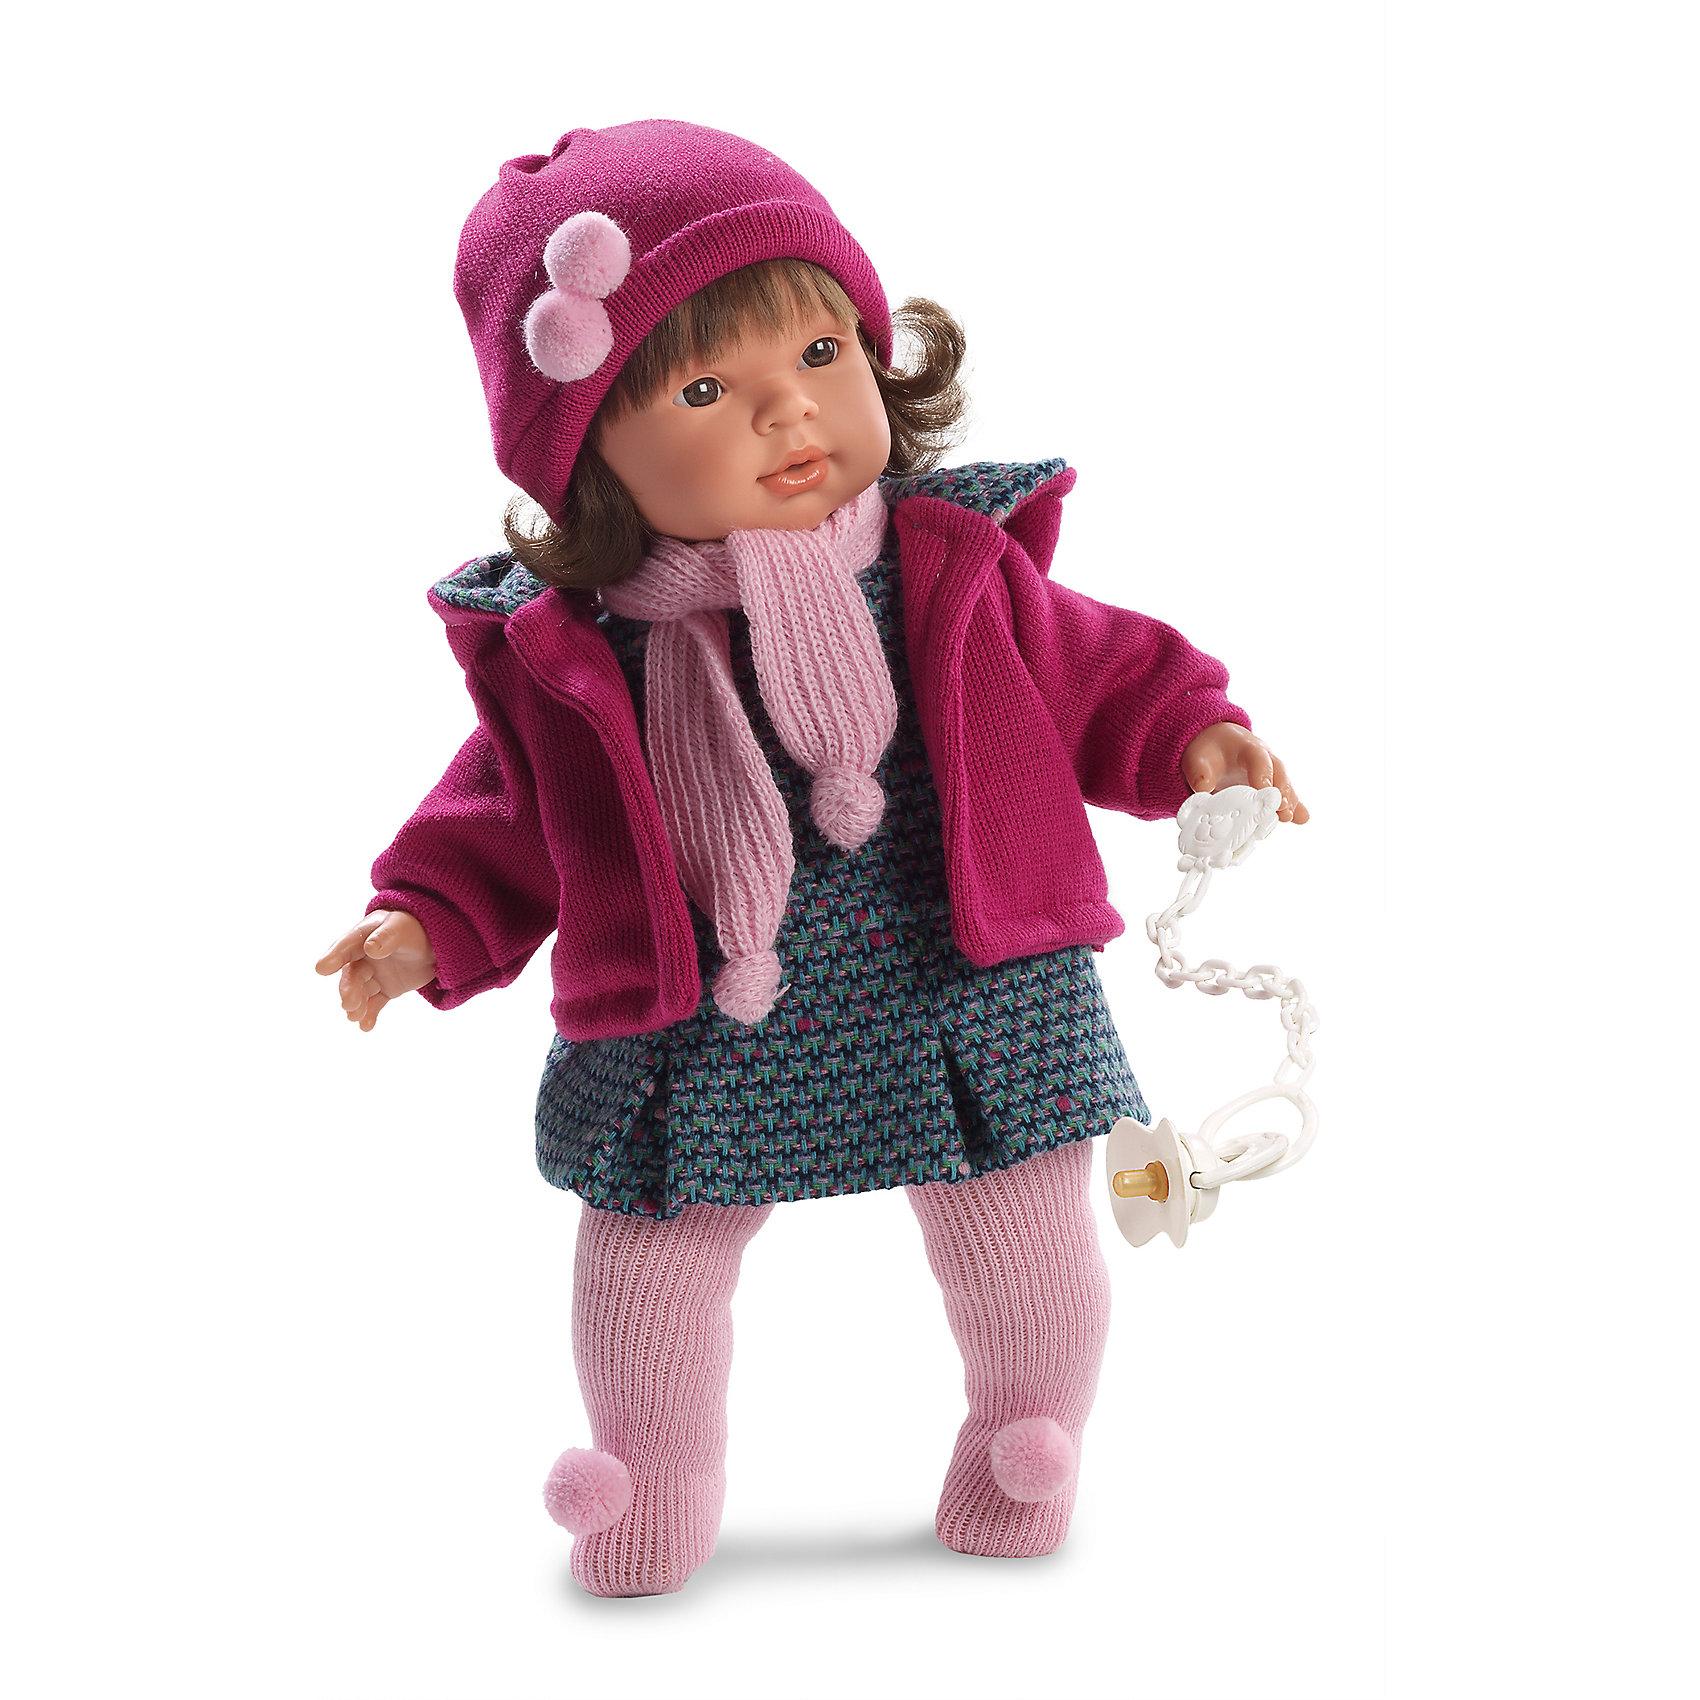 Llorens Кукла Карла, 42 см, Llorens куклы и одежда для кукол llorens кукла изабела 33 см со звуком